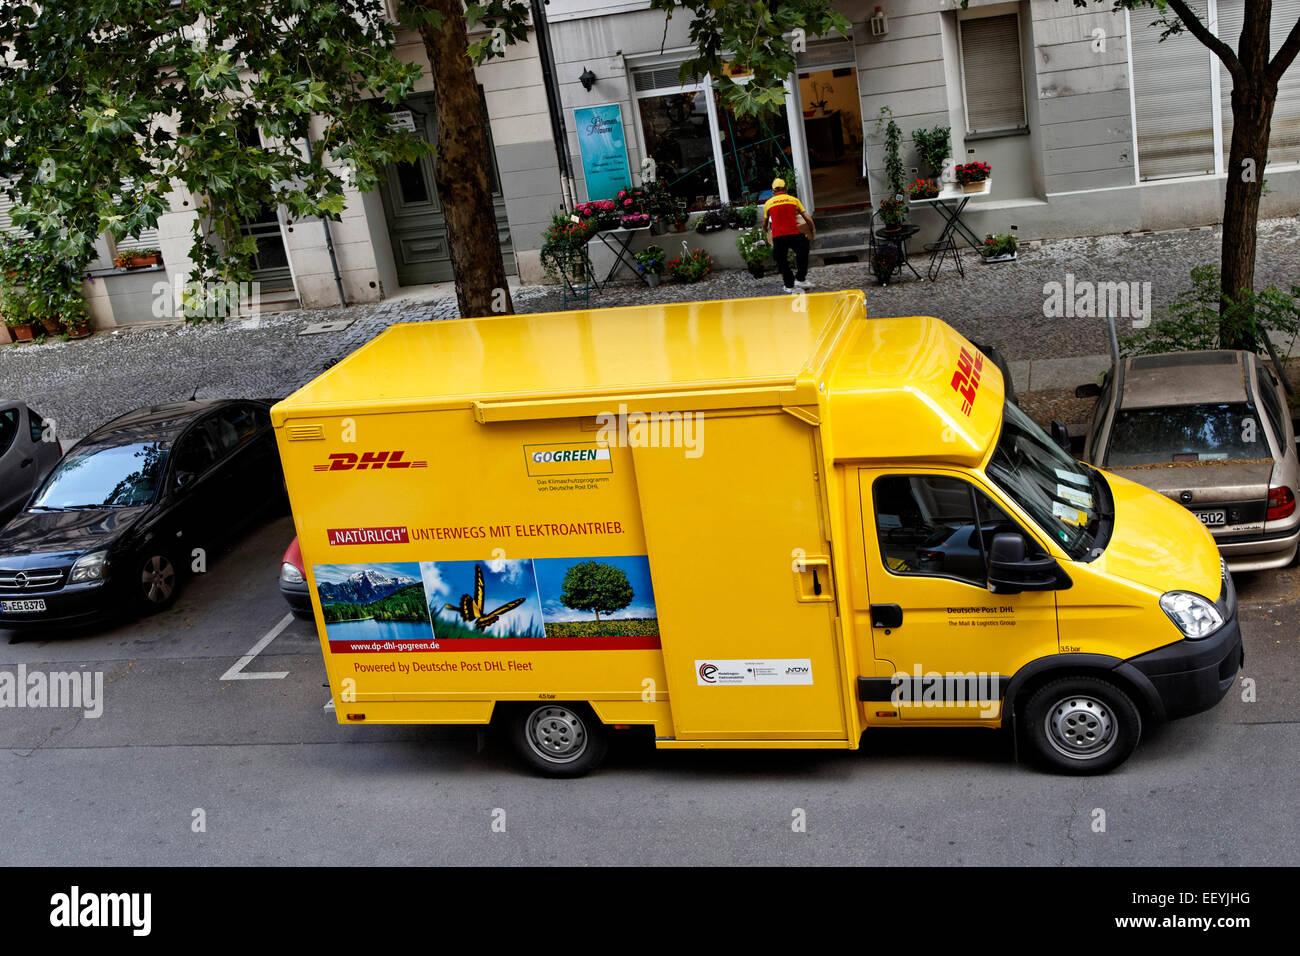 Dhl Paket Auto Stockfoto Bild 78053964 Alamy